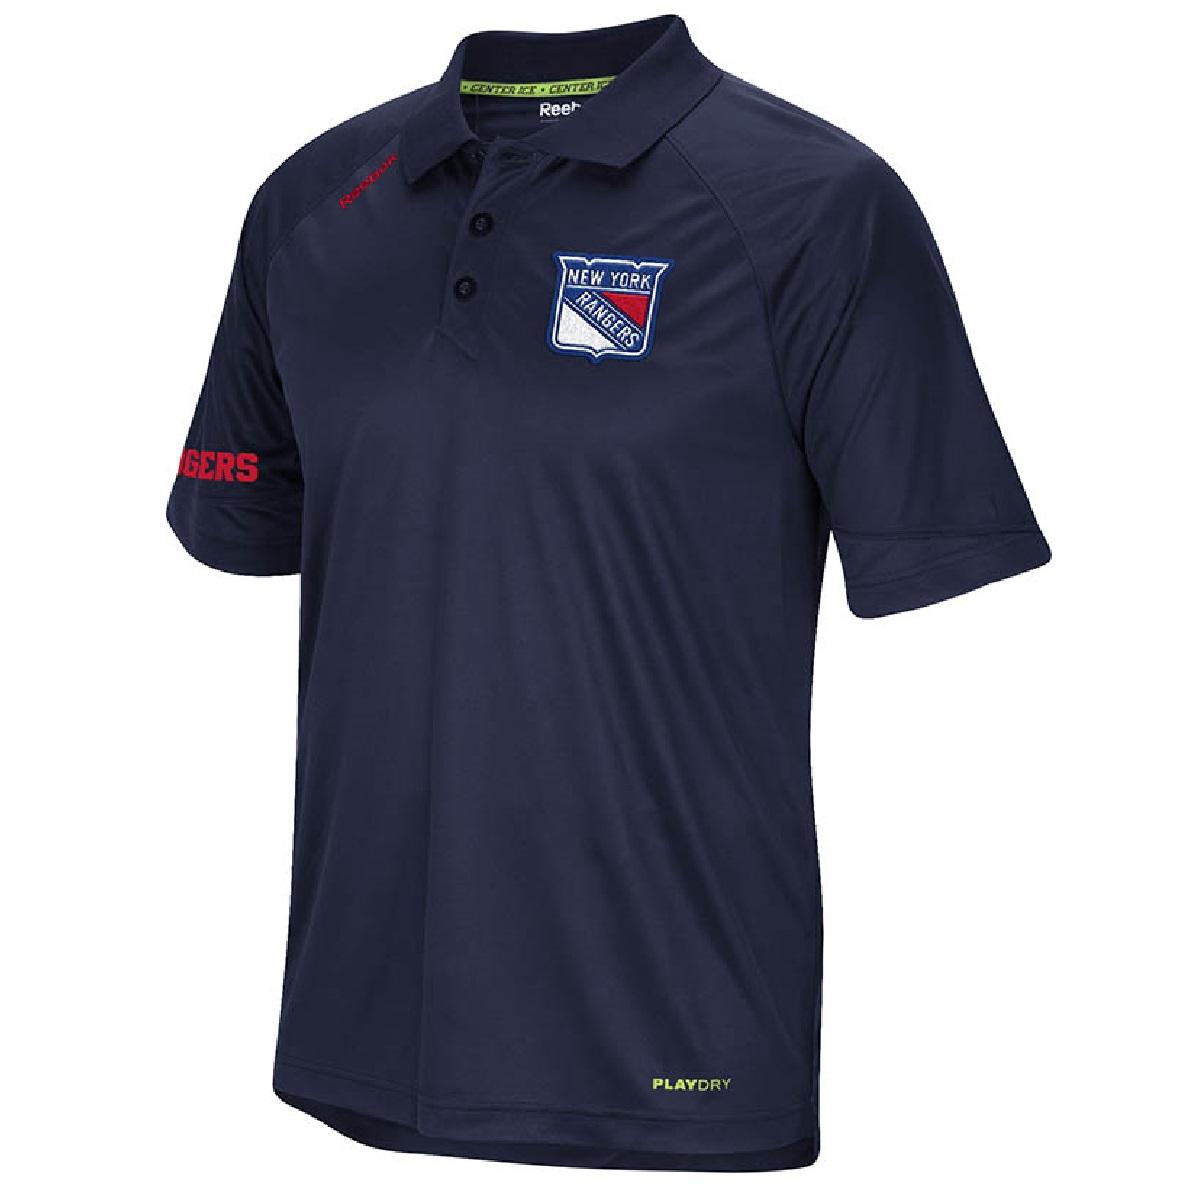 Reebok New York Rangers Navy Blue Center Ice Synthetic Po...